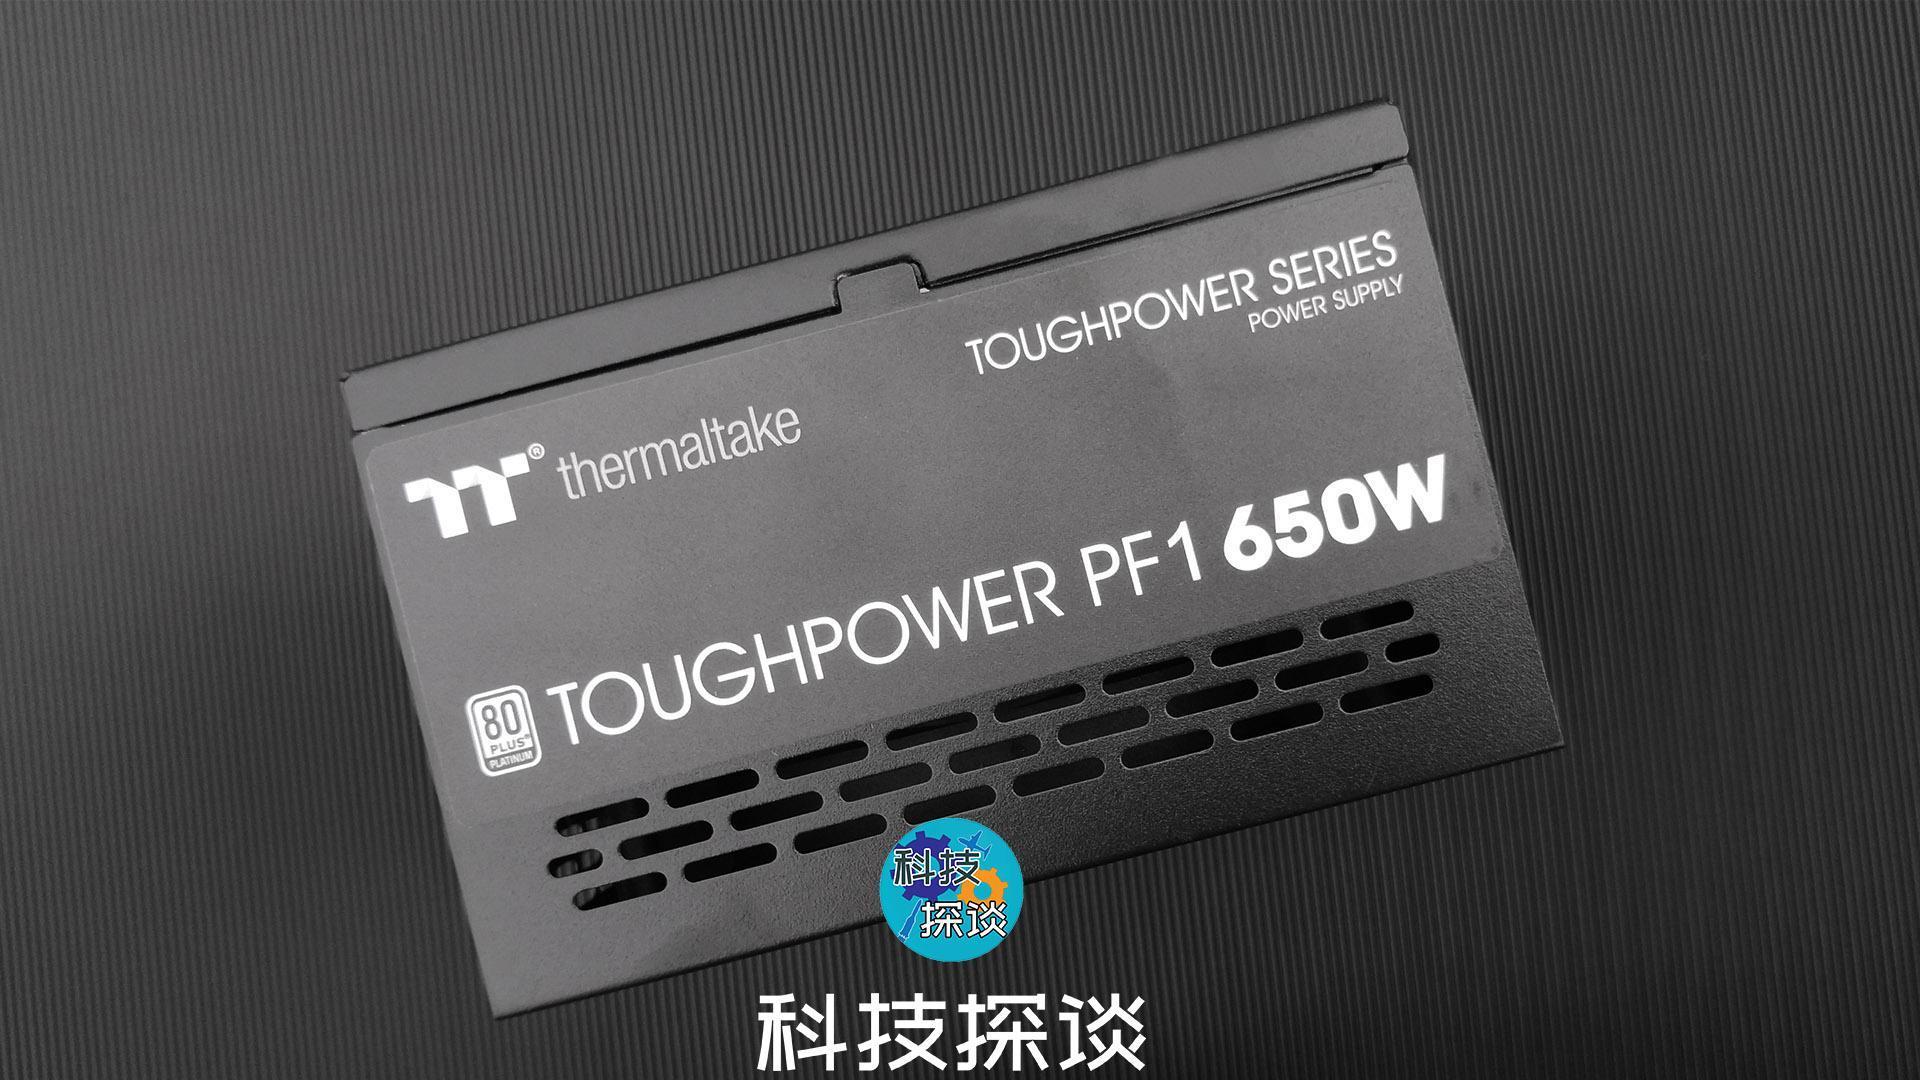 650W白金认证模组电源,智能温控低噪声,曜越钢影PF1测评